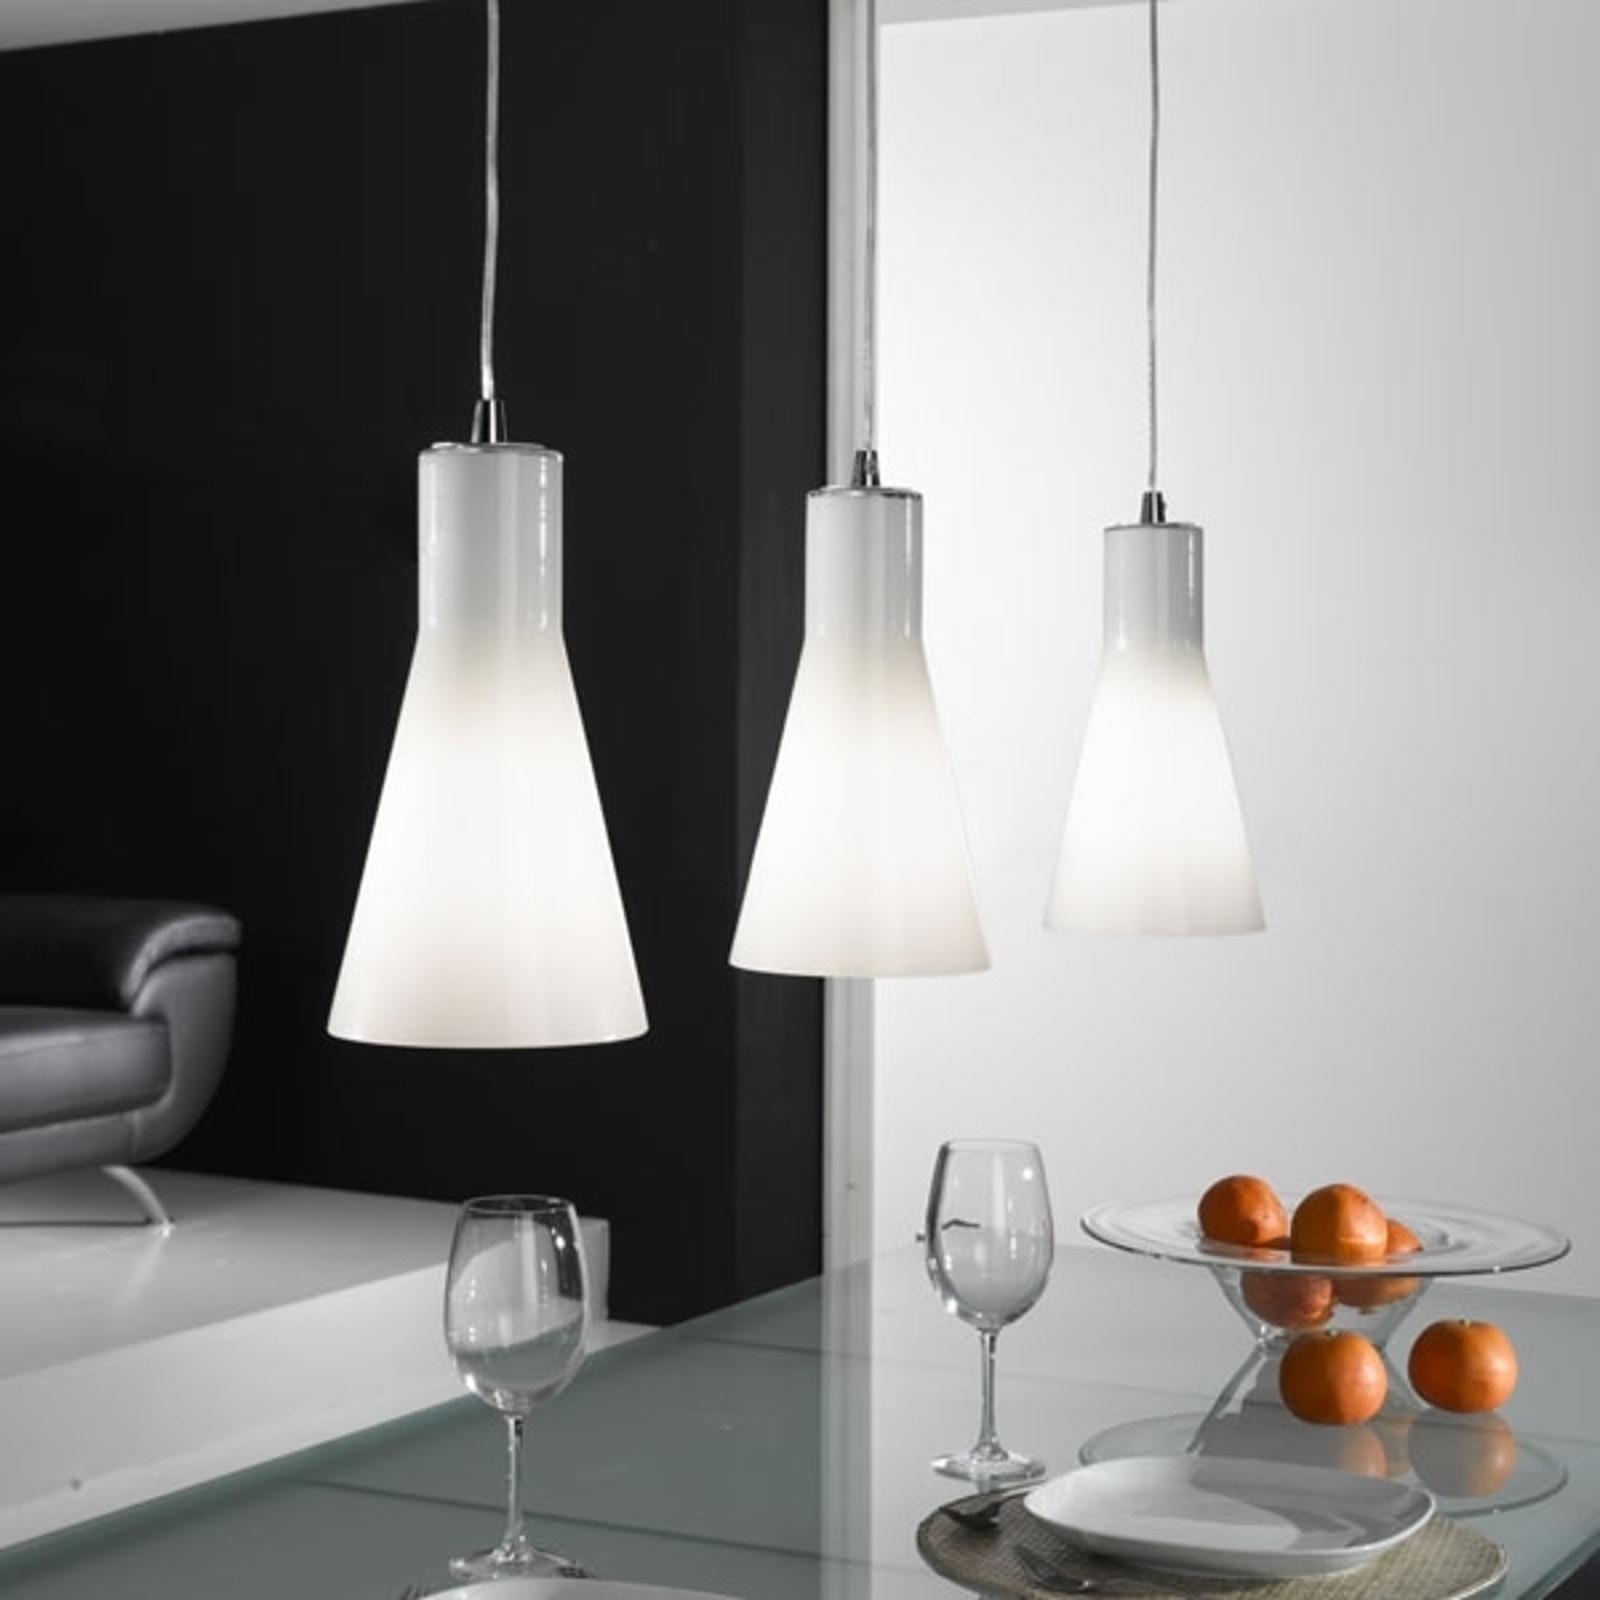 Dana glass hanging light, three-bulb_3501229_1